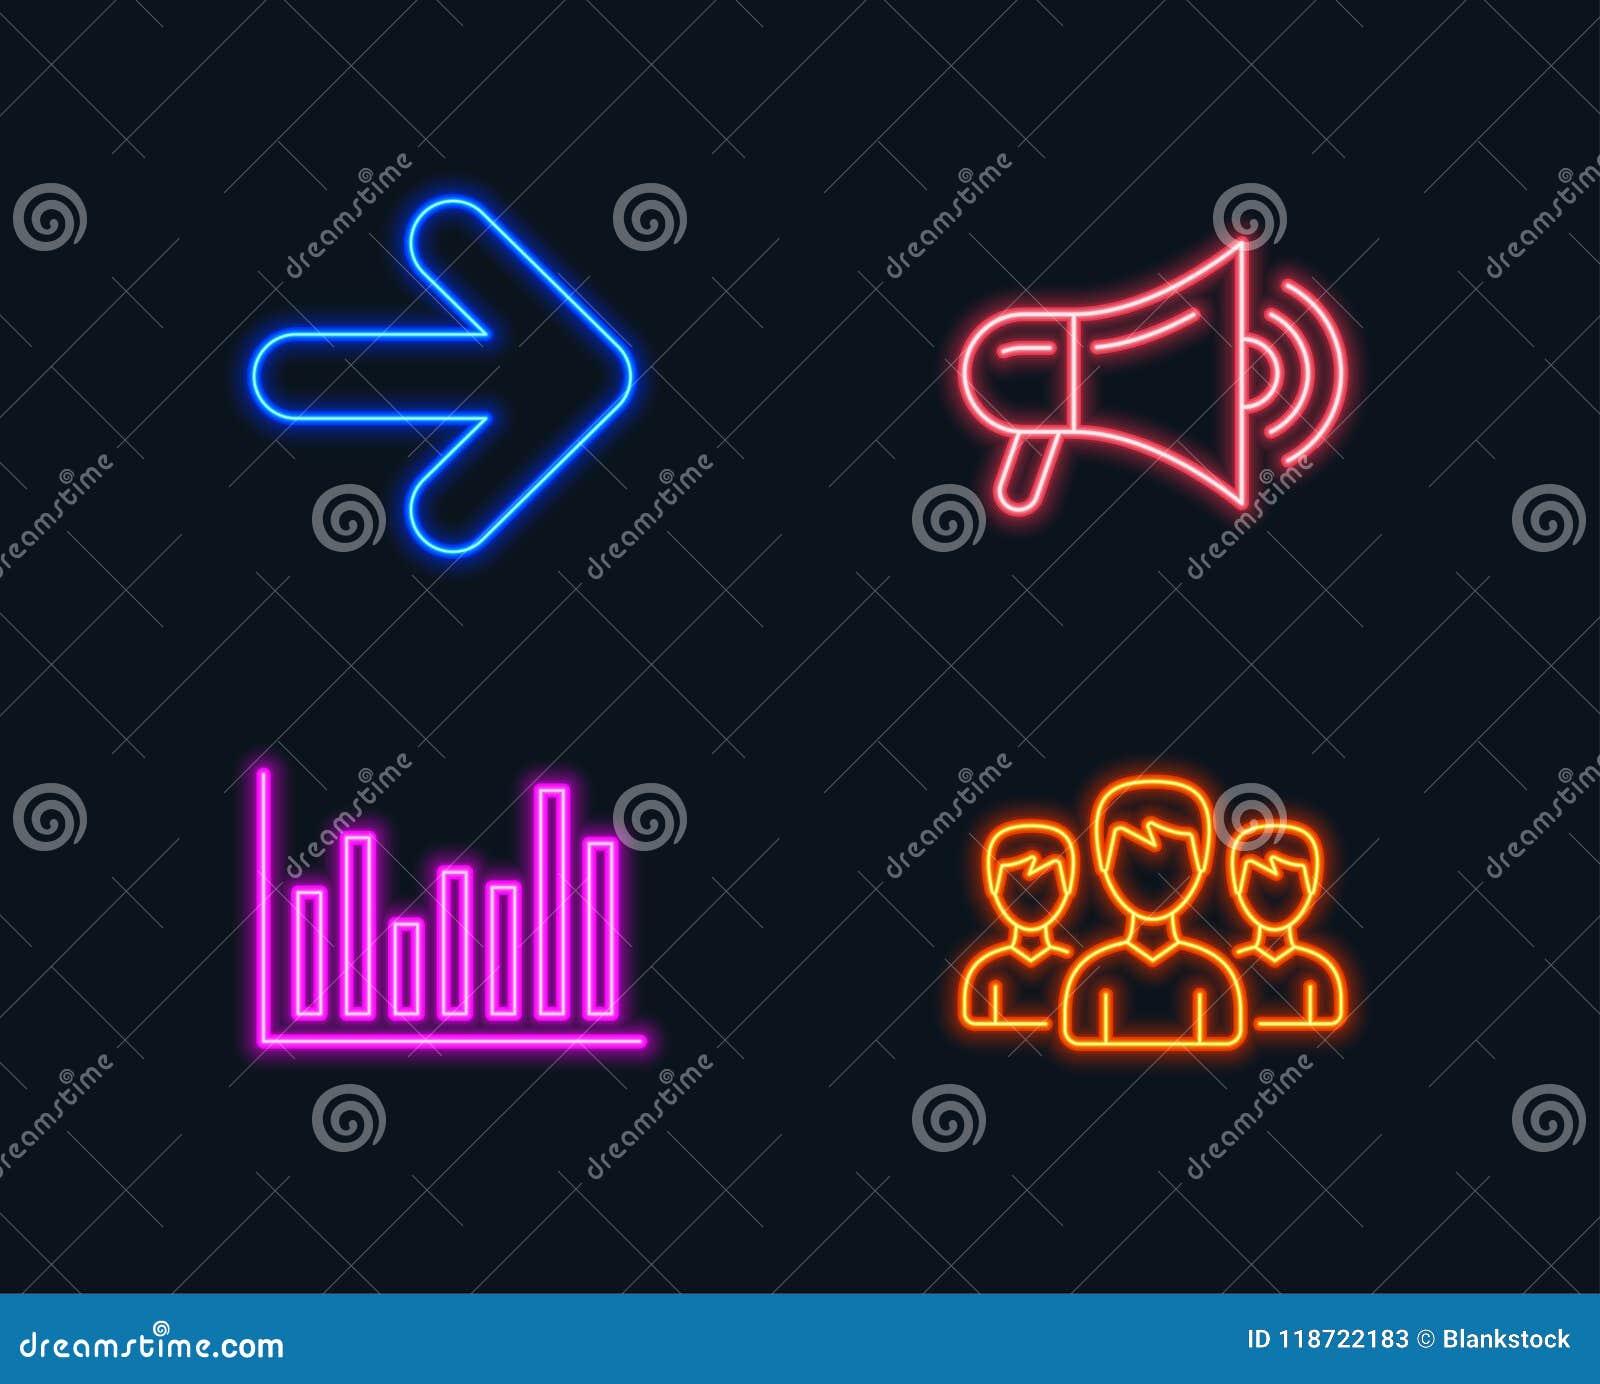 Next  Bar Diagram And Megaphone Icons  Group Sign  Forward